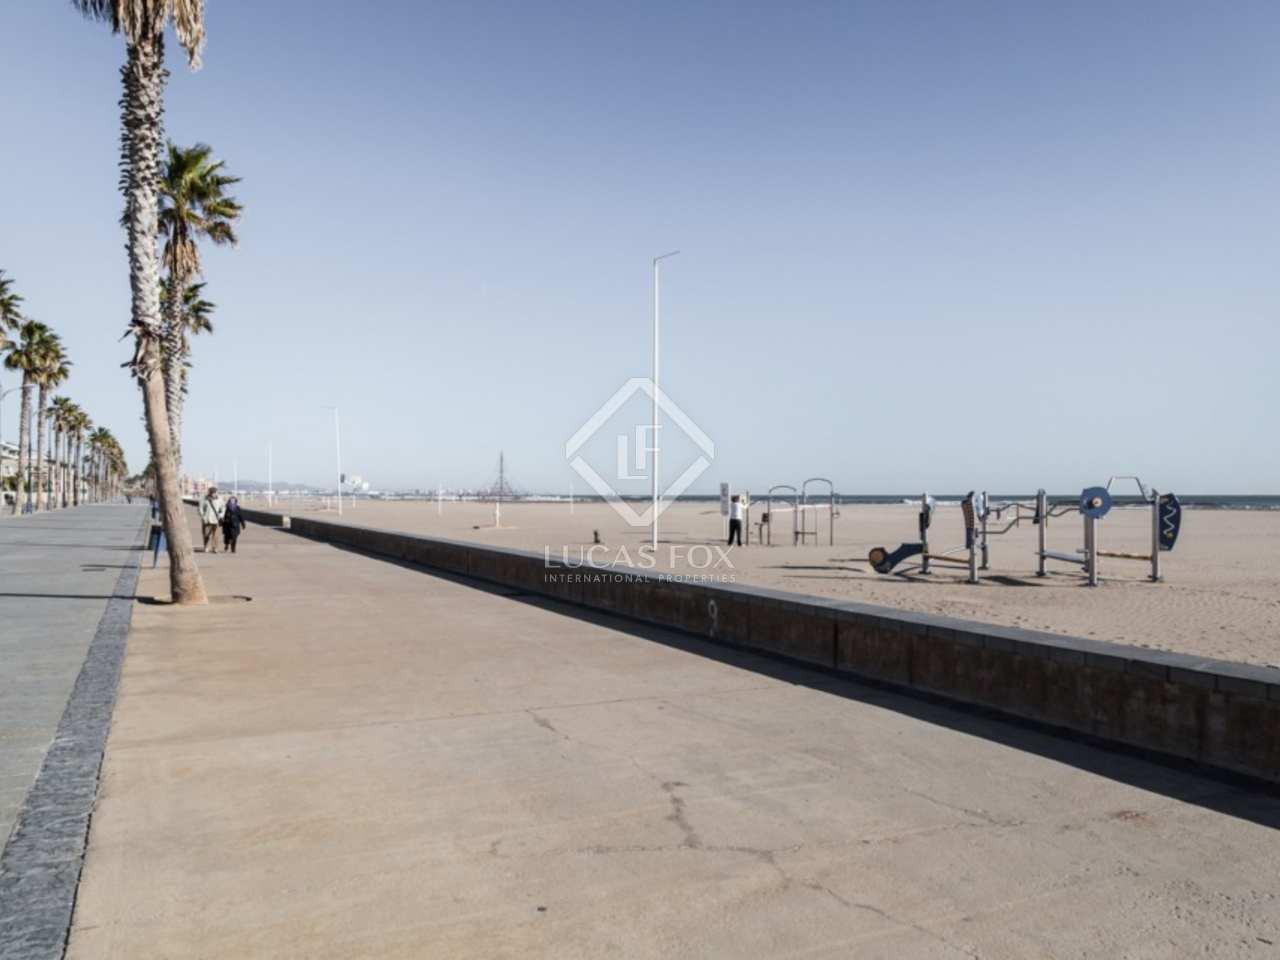 Apartamento en playa patacona a la venta for Piscina patacona